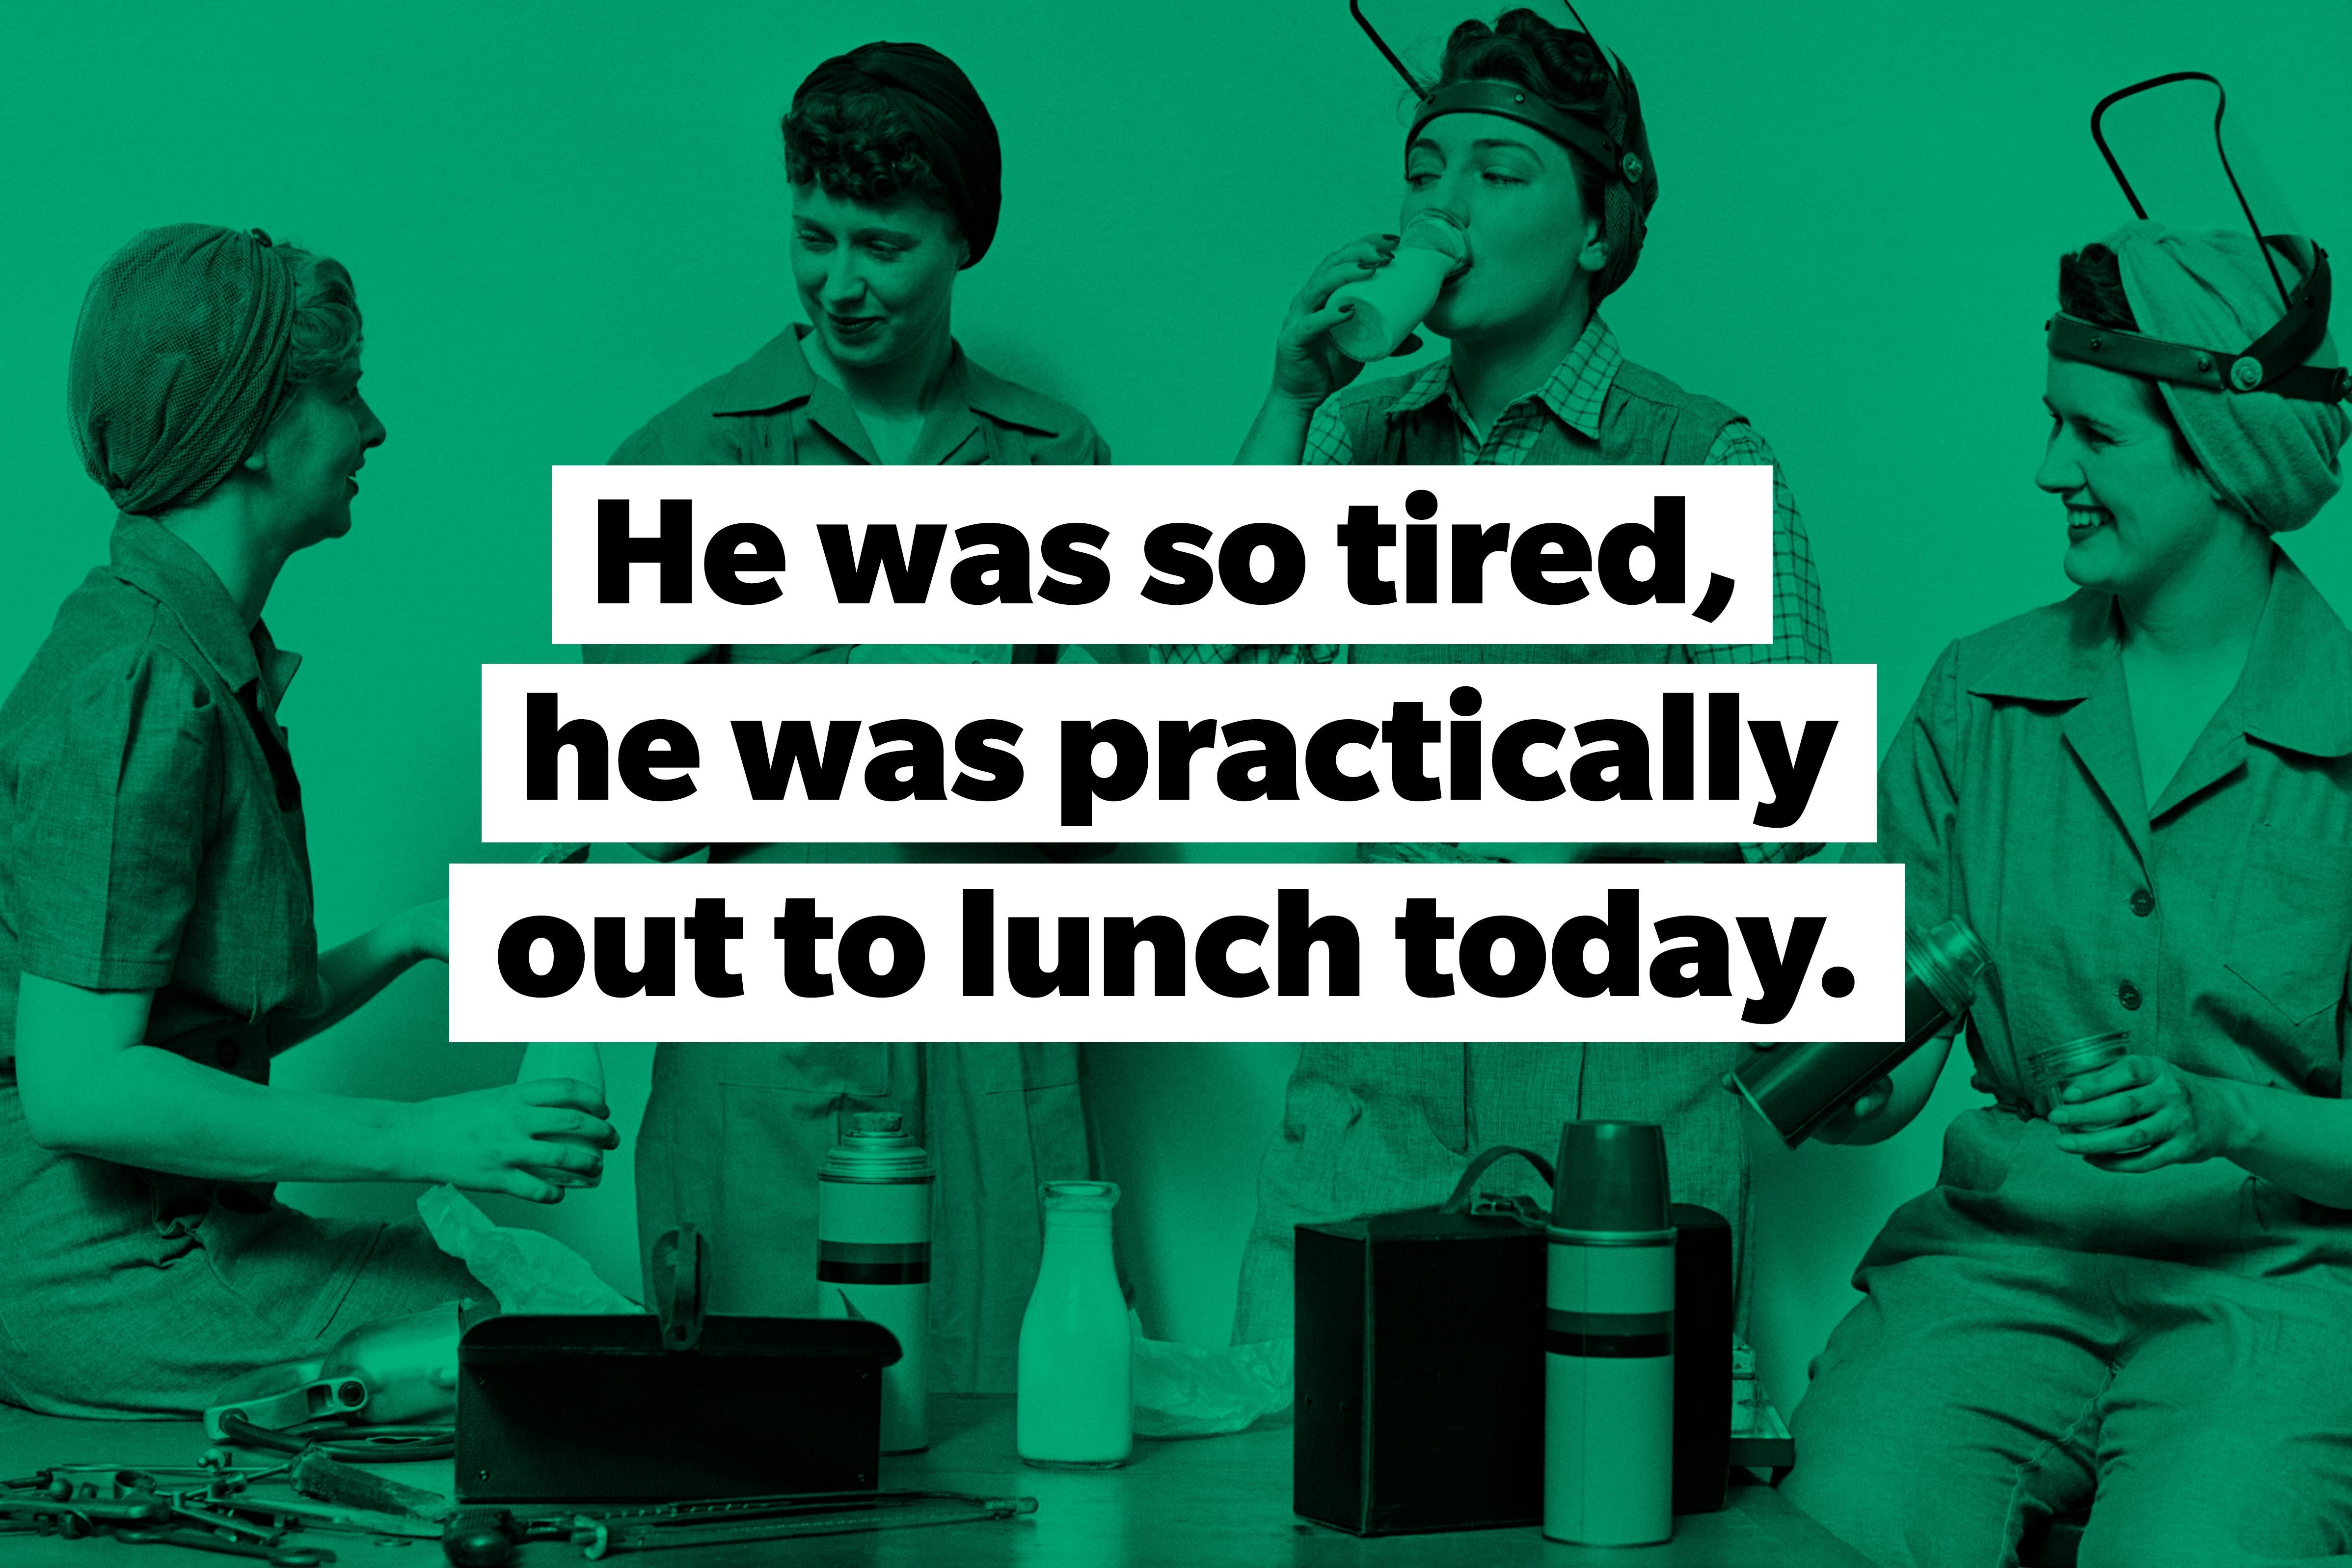 lunch slang